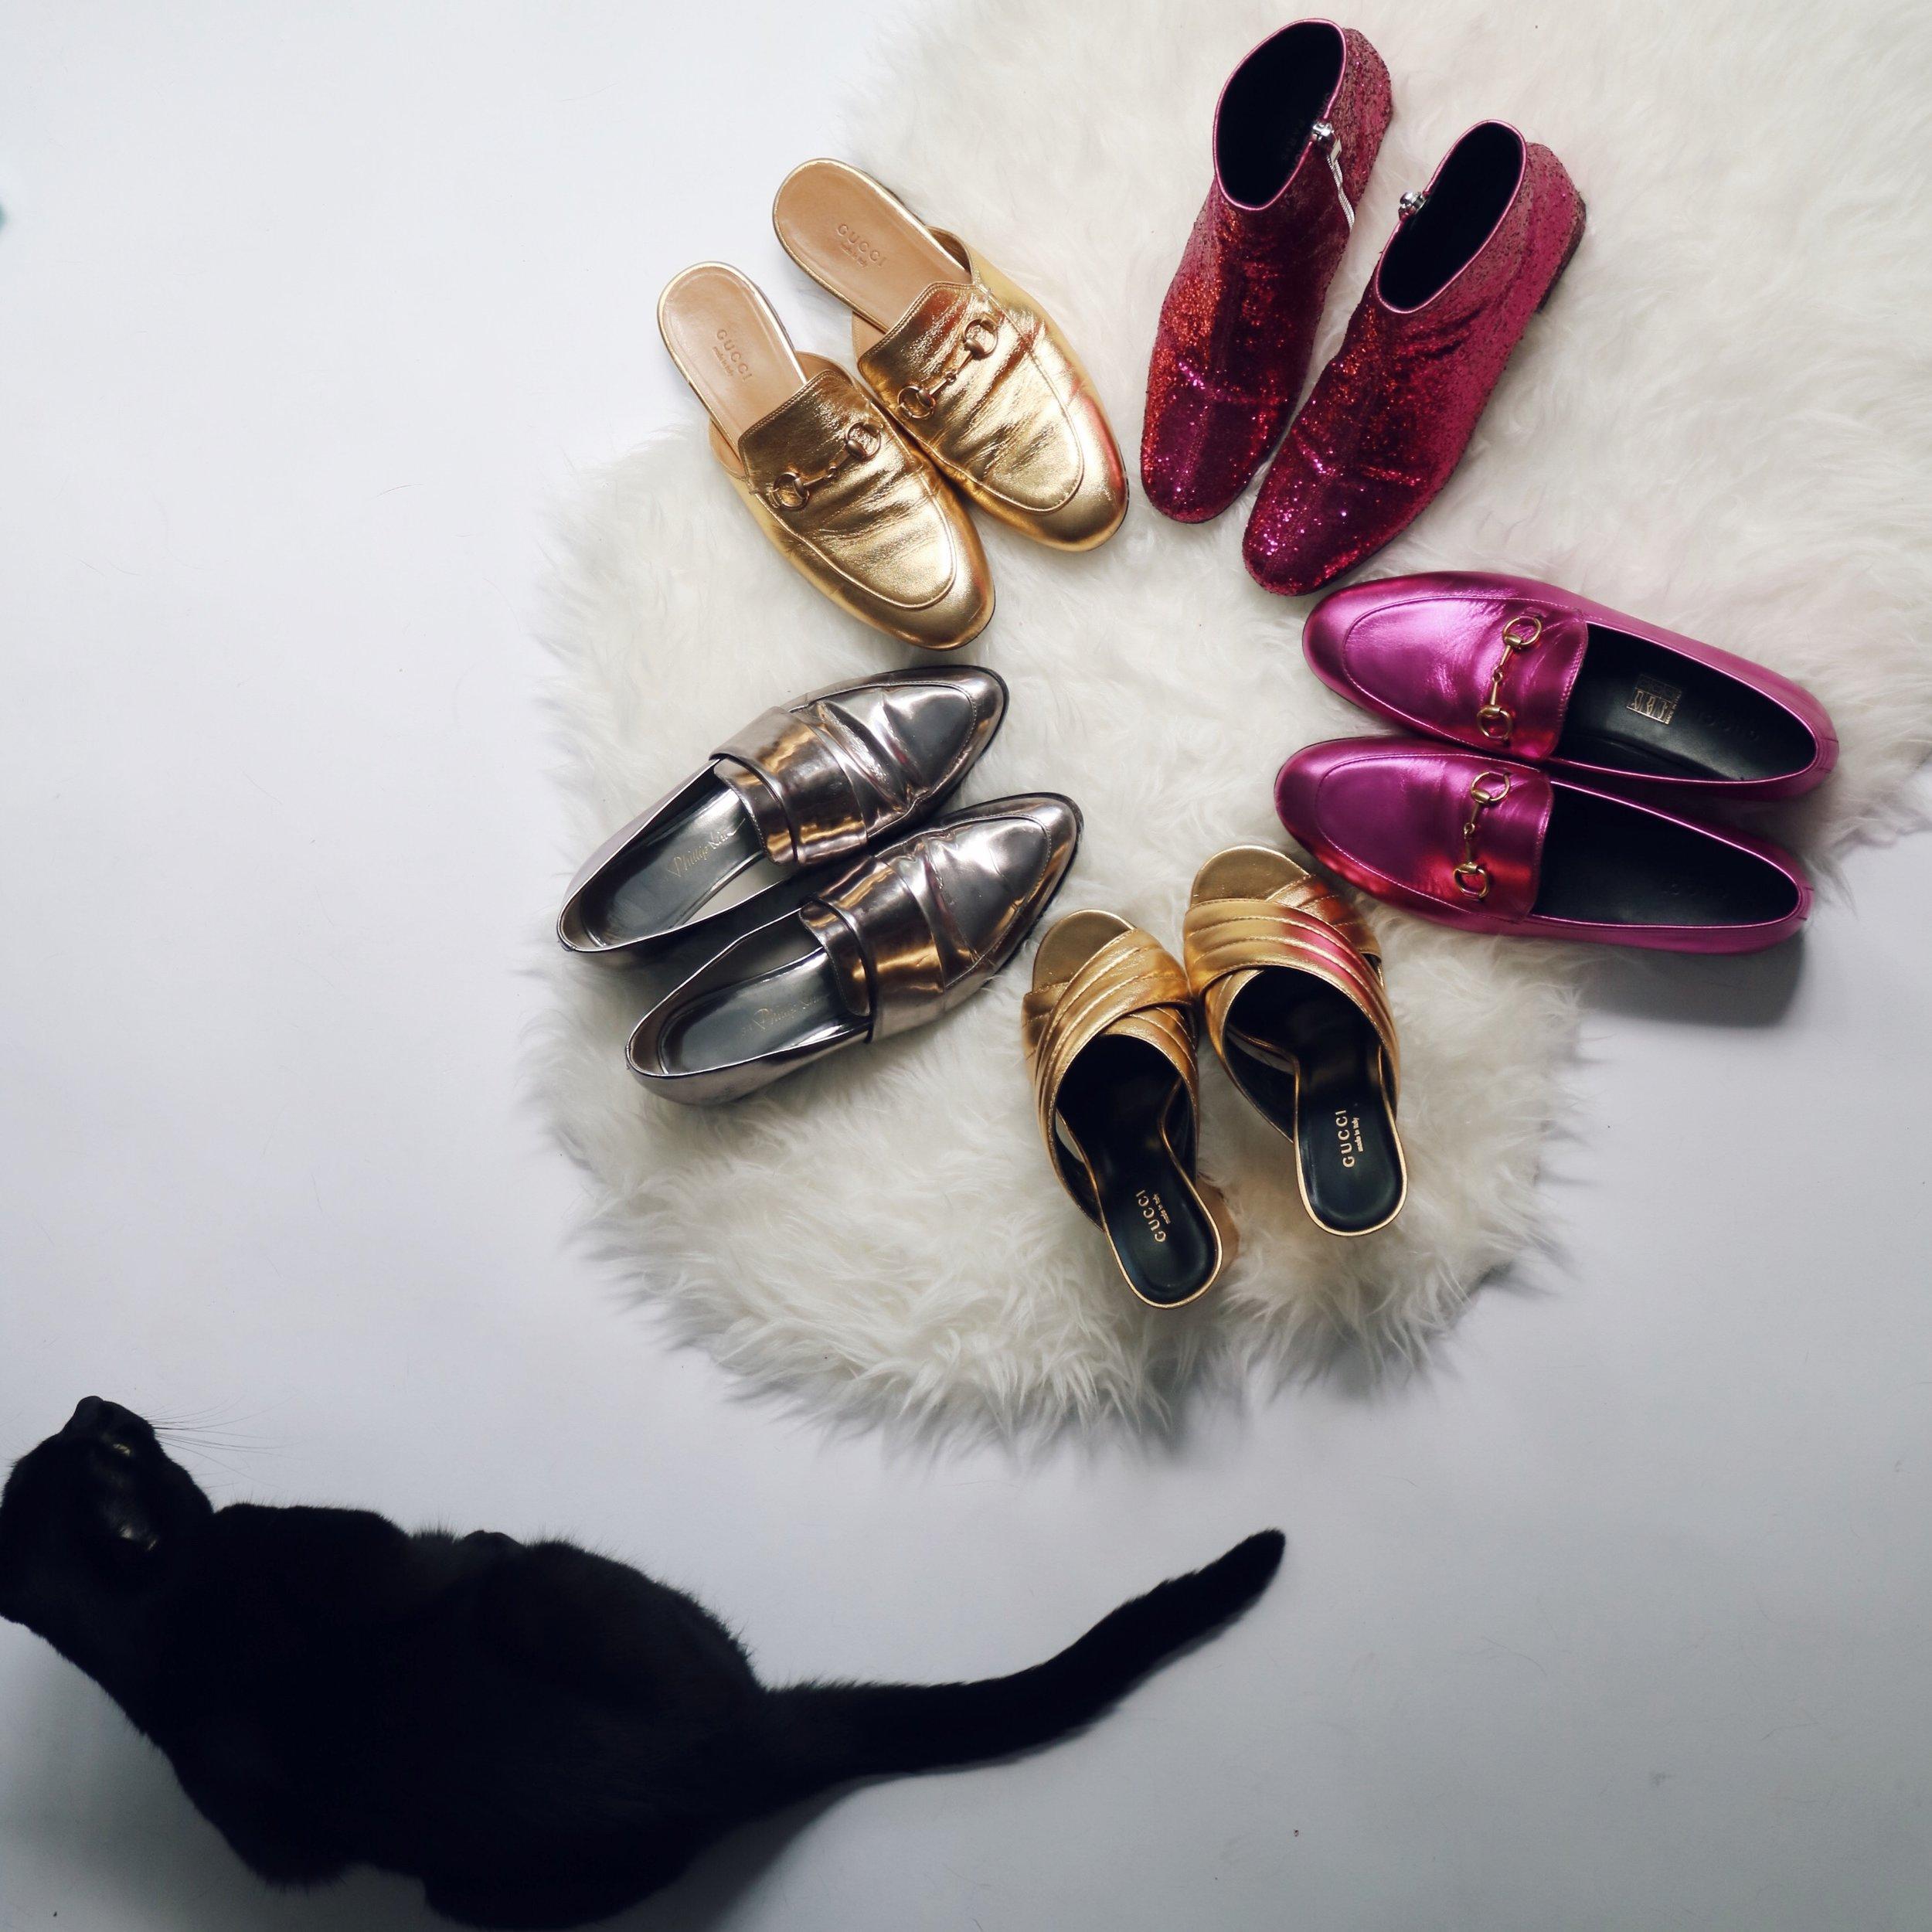 Gucci Shoe Haul and More - WoahStyle.com_0697.JPG